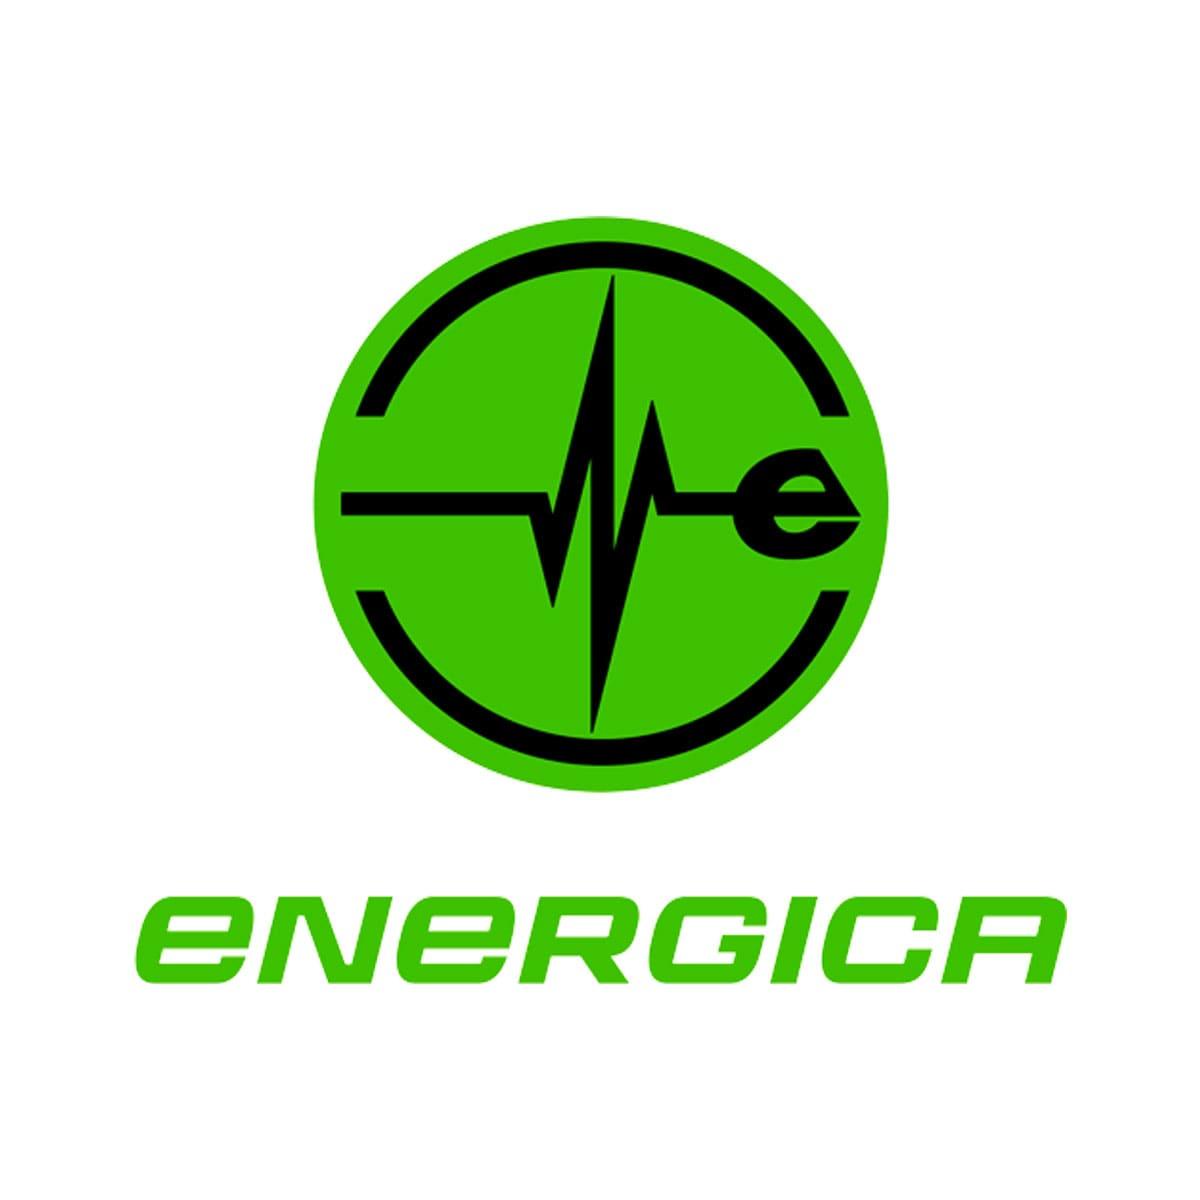 Energica Motor Company, i target del piano industriale 2020-2022